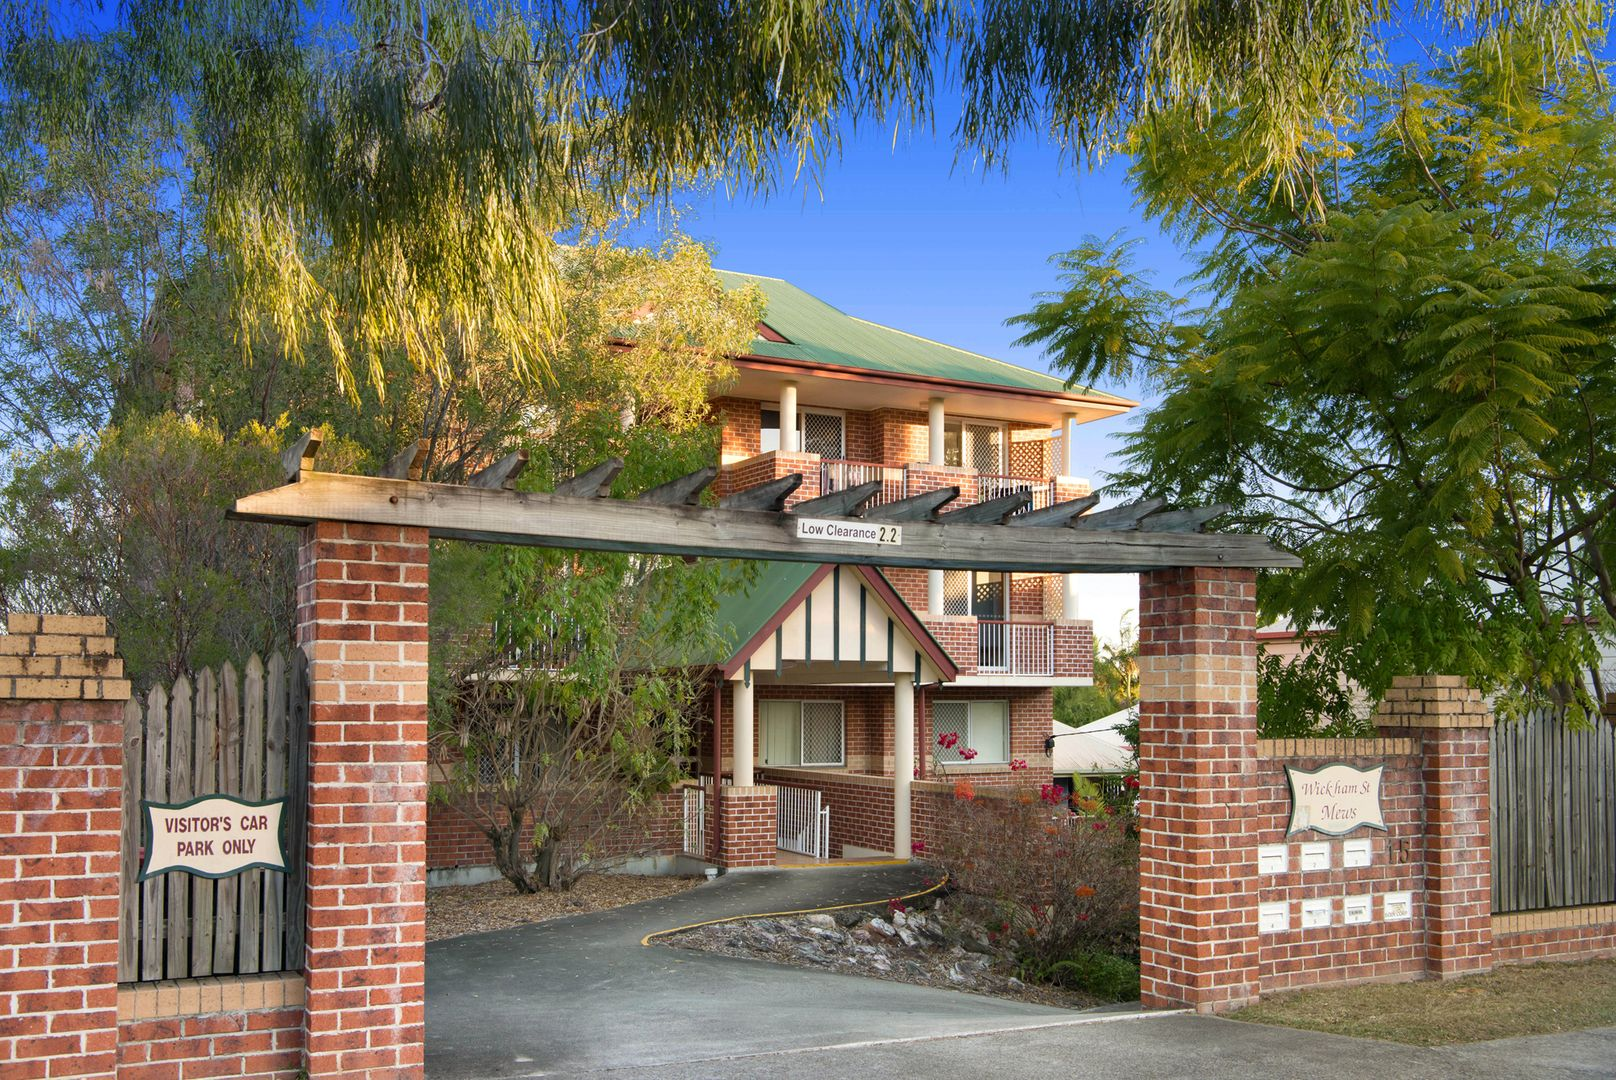 3/15 Wickham Street, Newmarket QLD 4051, Image 1